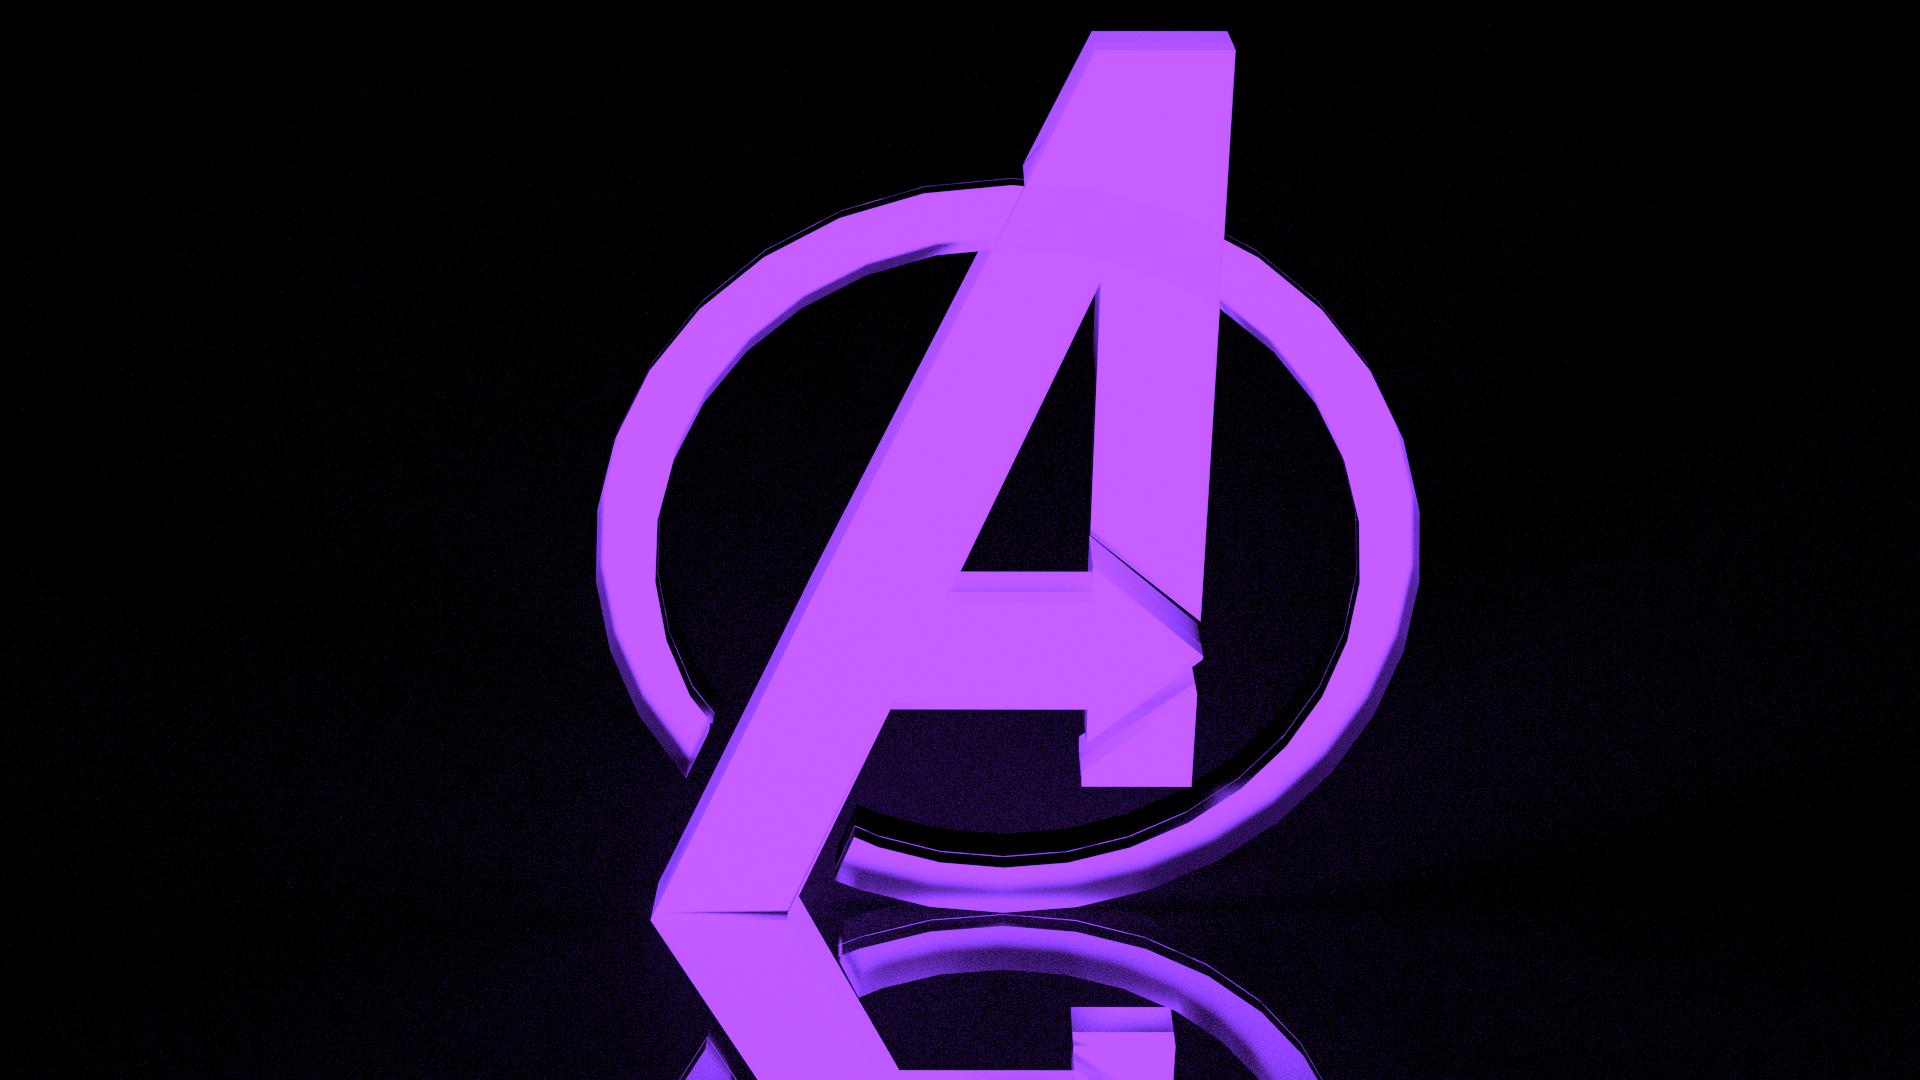 Avengers hawkeye logo